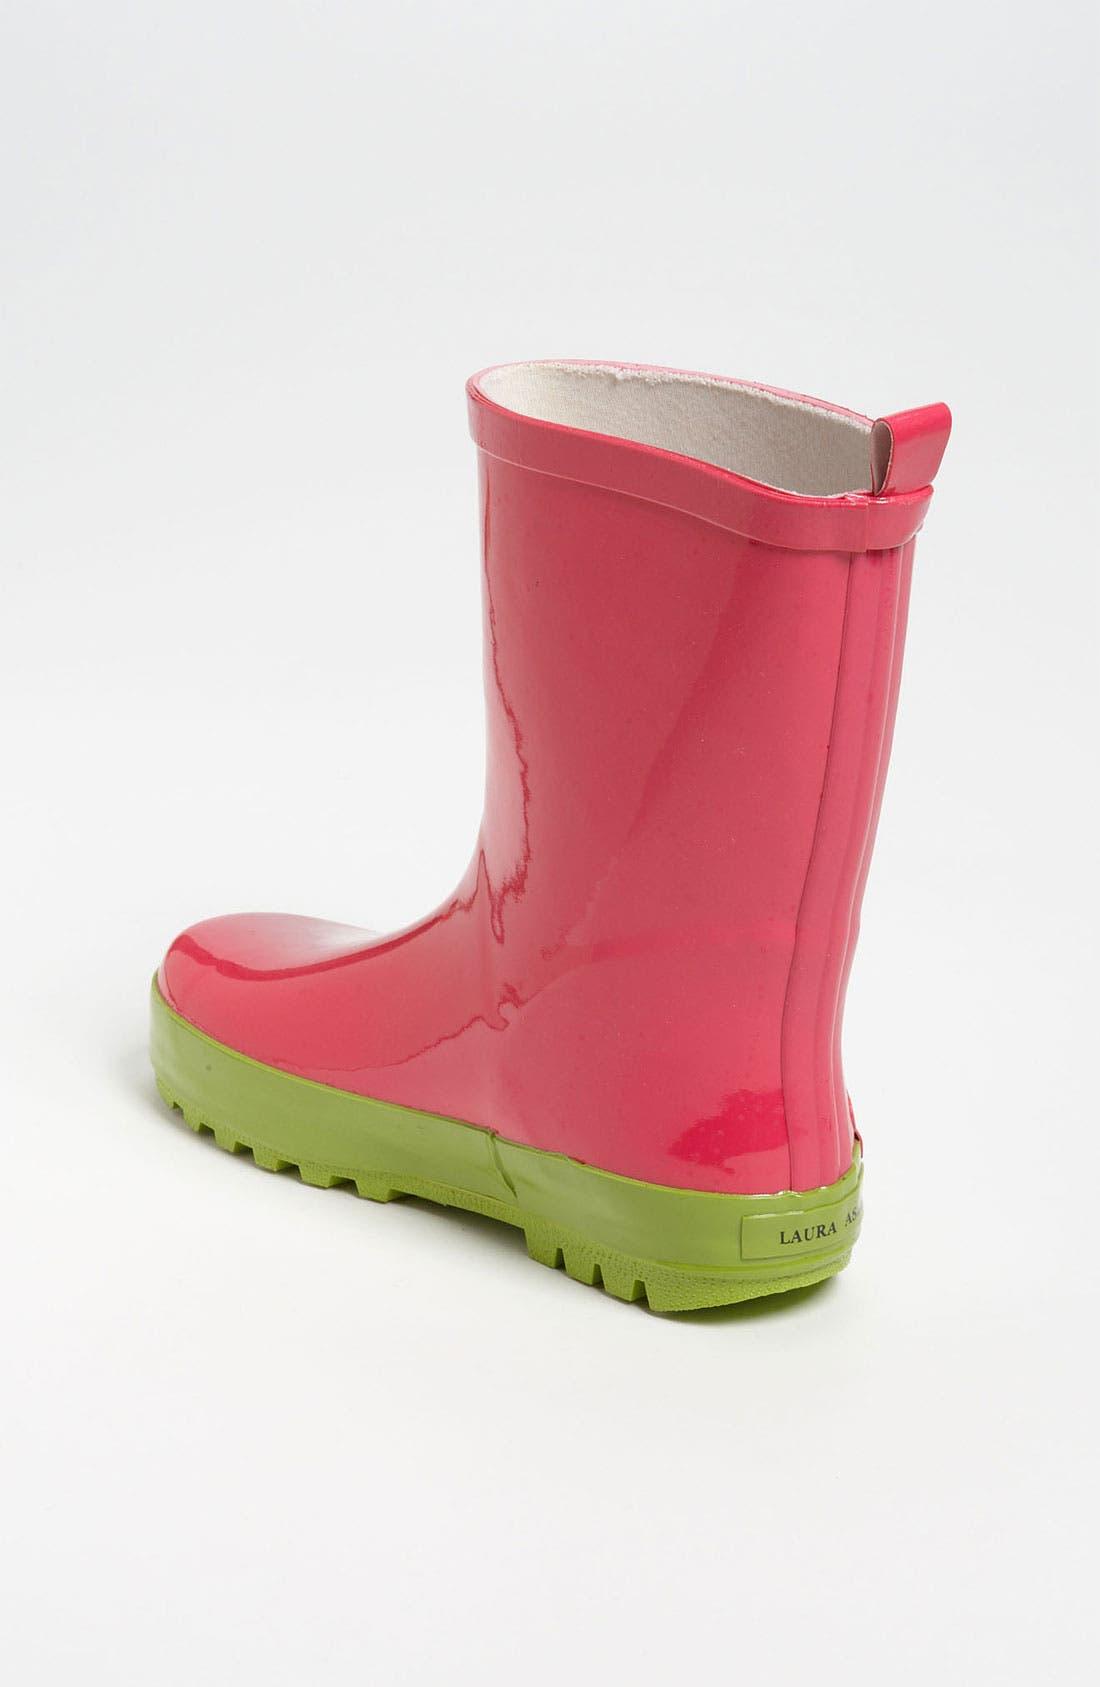 Alternate Image 2  - Laura Ashley 'Garden' Rain Boot (Walker, Toddler, Little Kid & Big Kid)